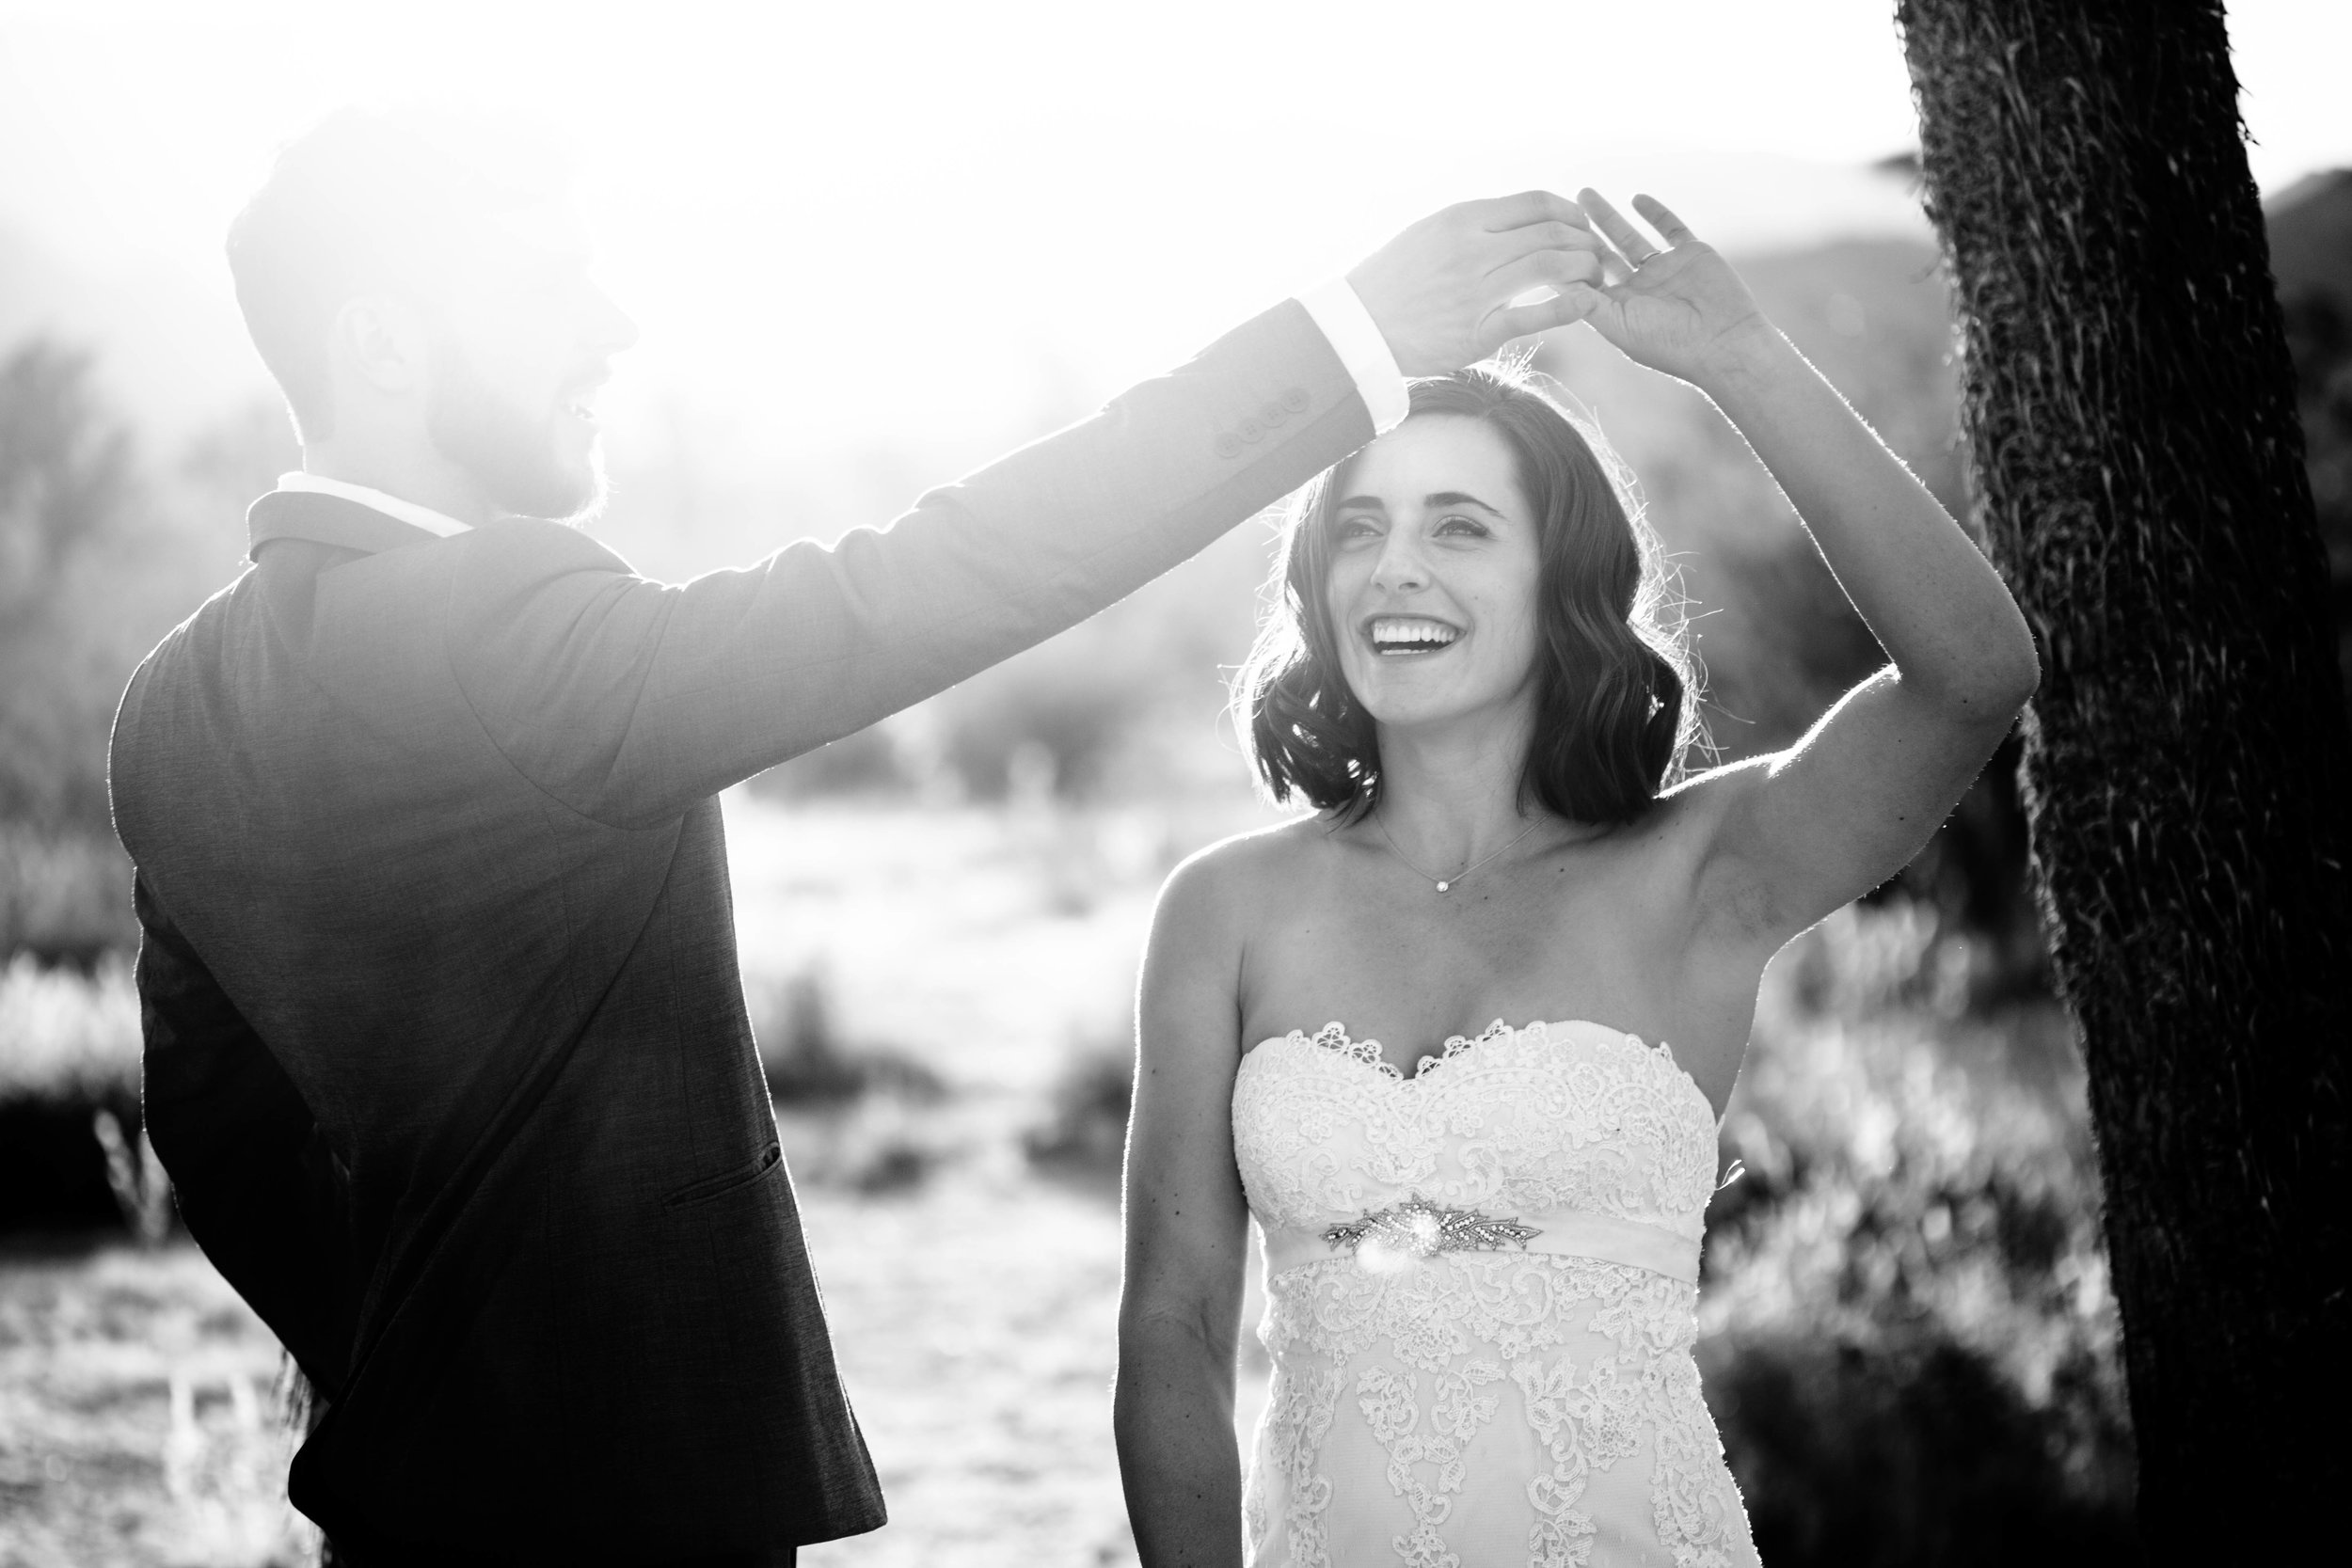 nicole-daacke-photography-joshua-tree-adventurous-elopement-wedding-national-park-wedding-photographer-adventure-wedding-adventurous-elopement-jtree-joshua-tree-national-park-wedding-photographer-intimate-weddings-golden-desert-love-5.jpg